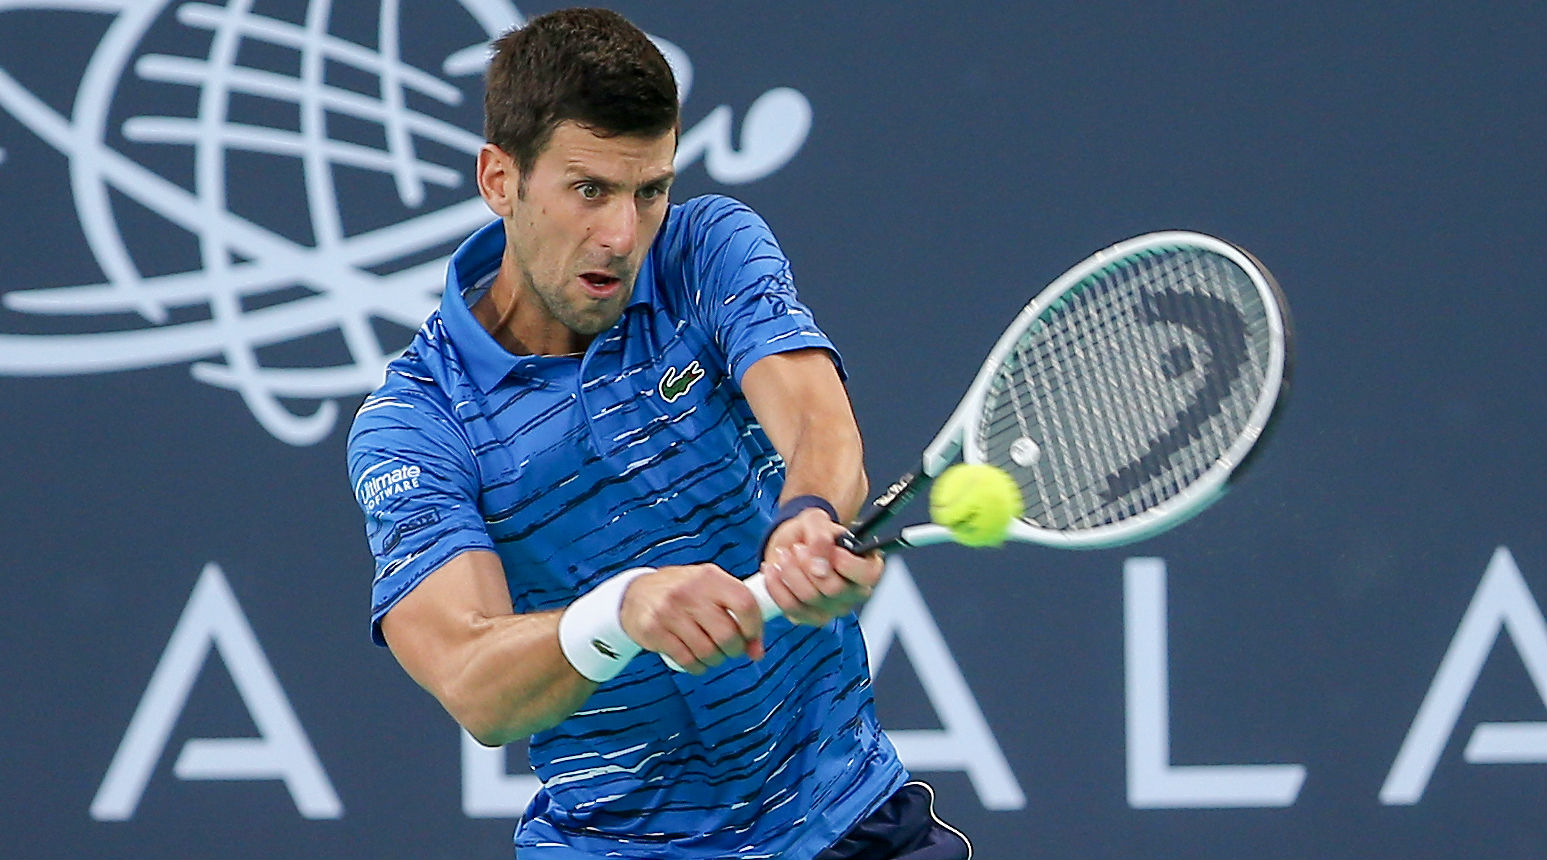 Novak Djokovic Beats Dominic Thiem in a Five-Set Thriller ...